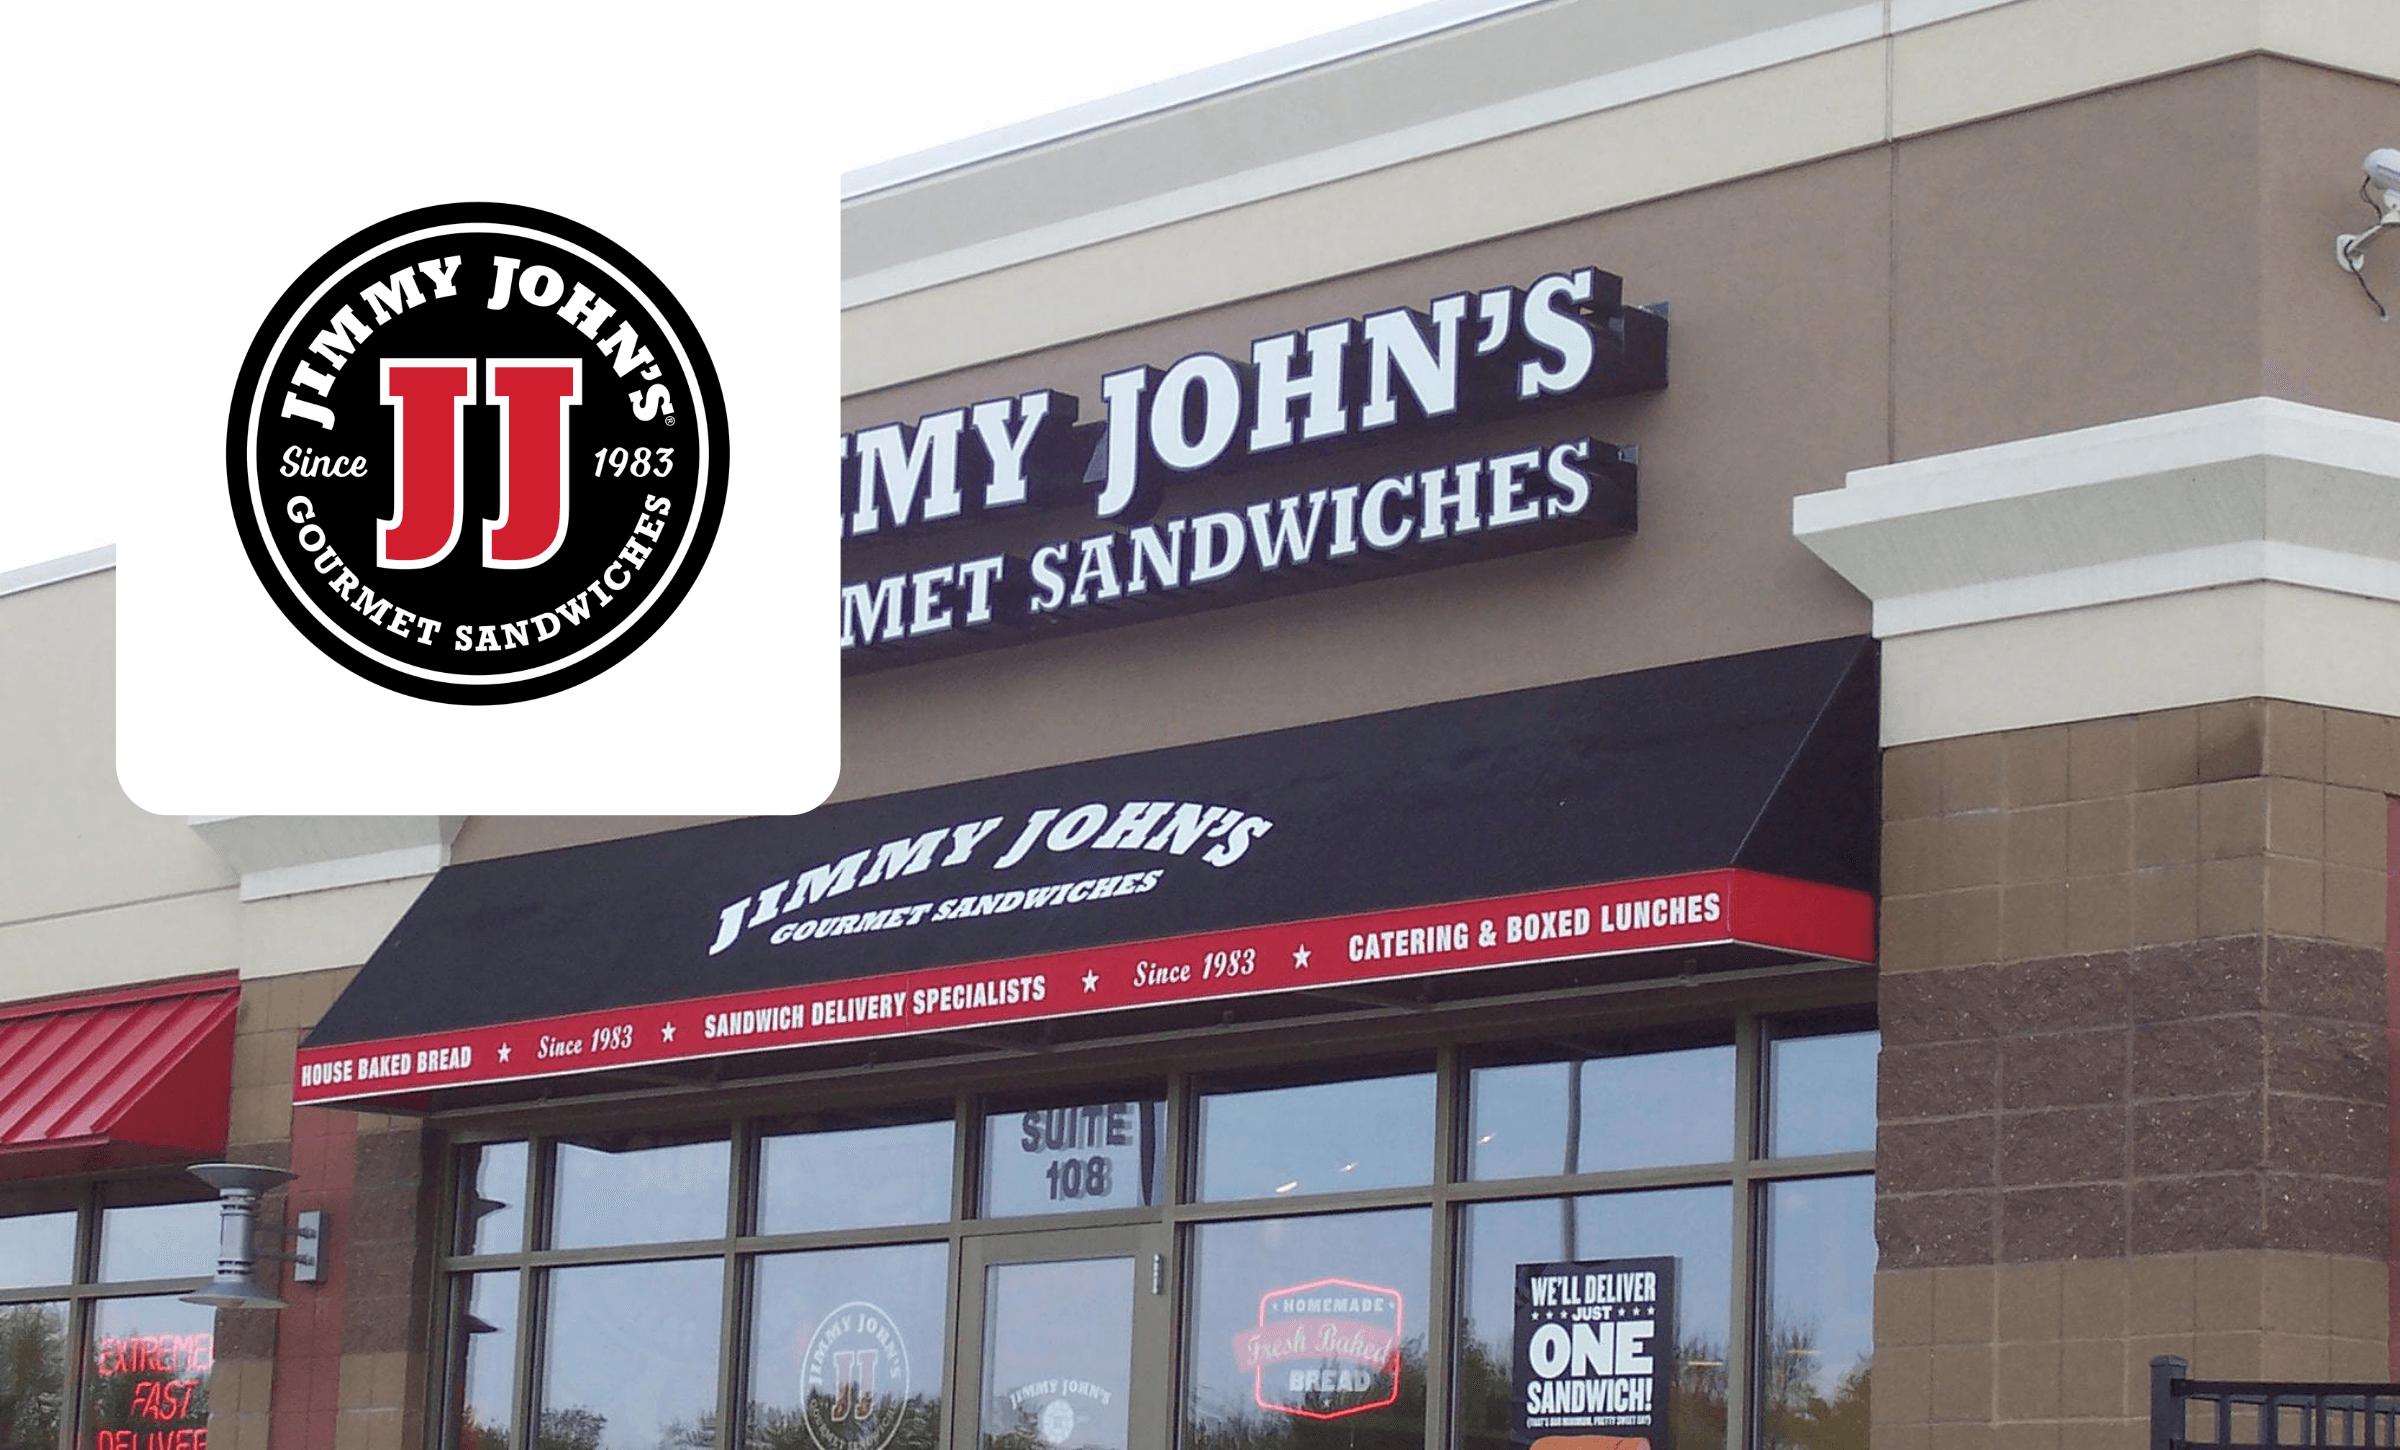 Jimmy John's storefront and logo